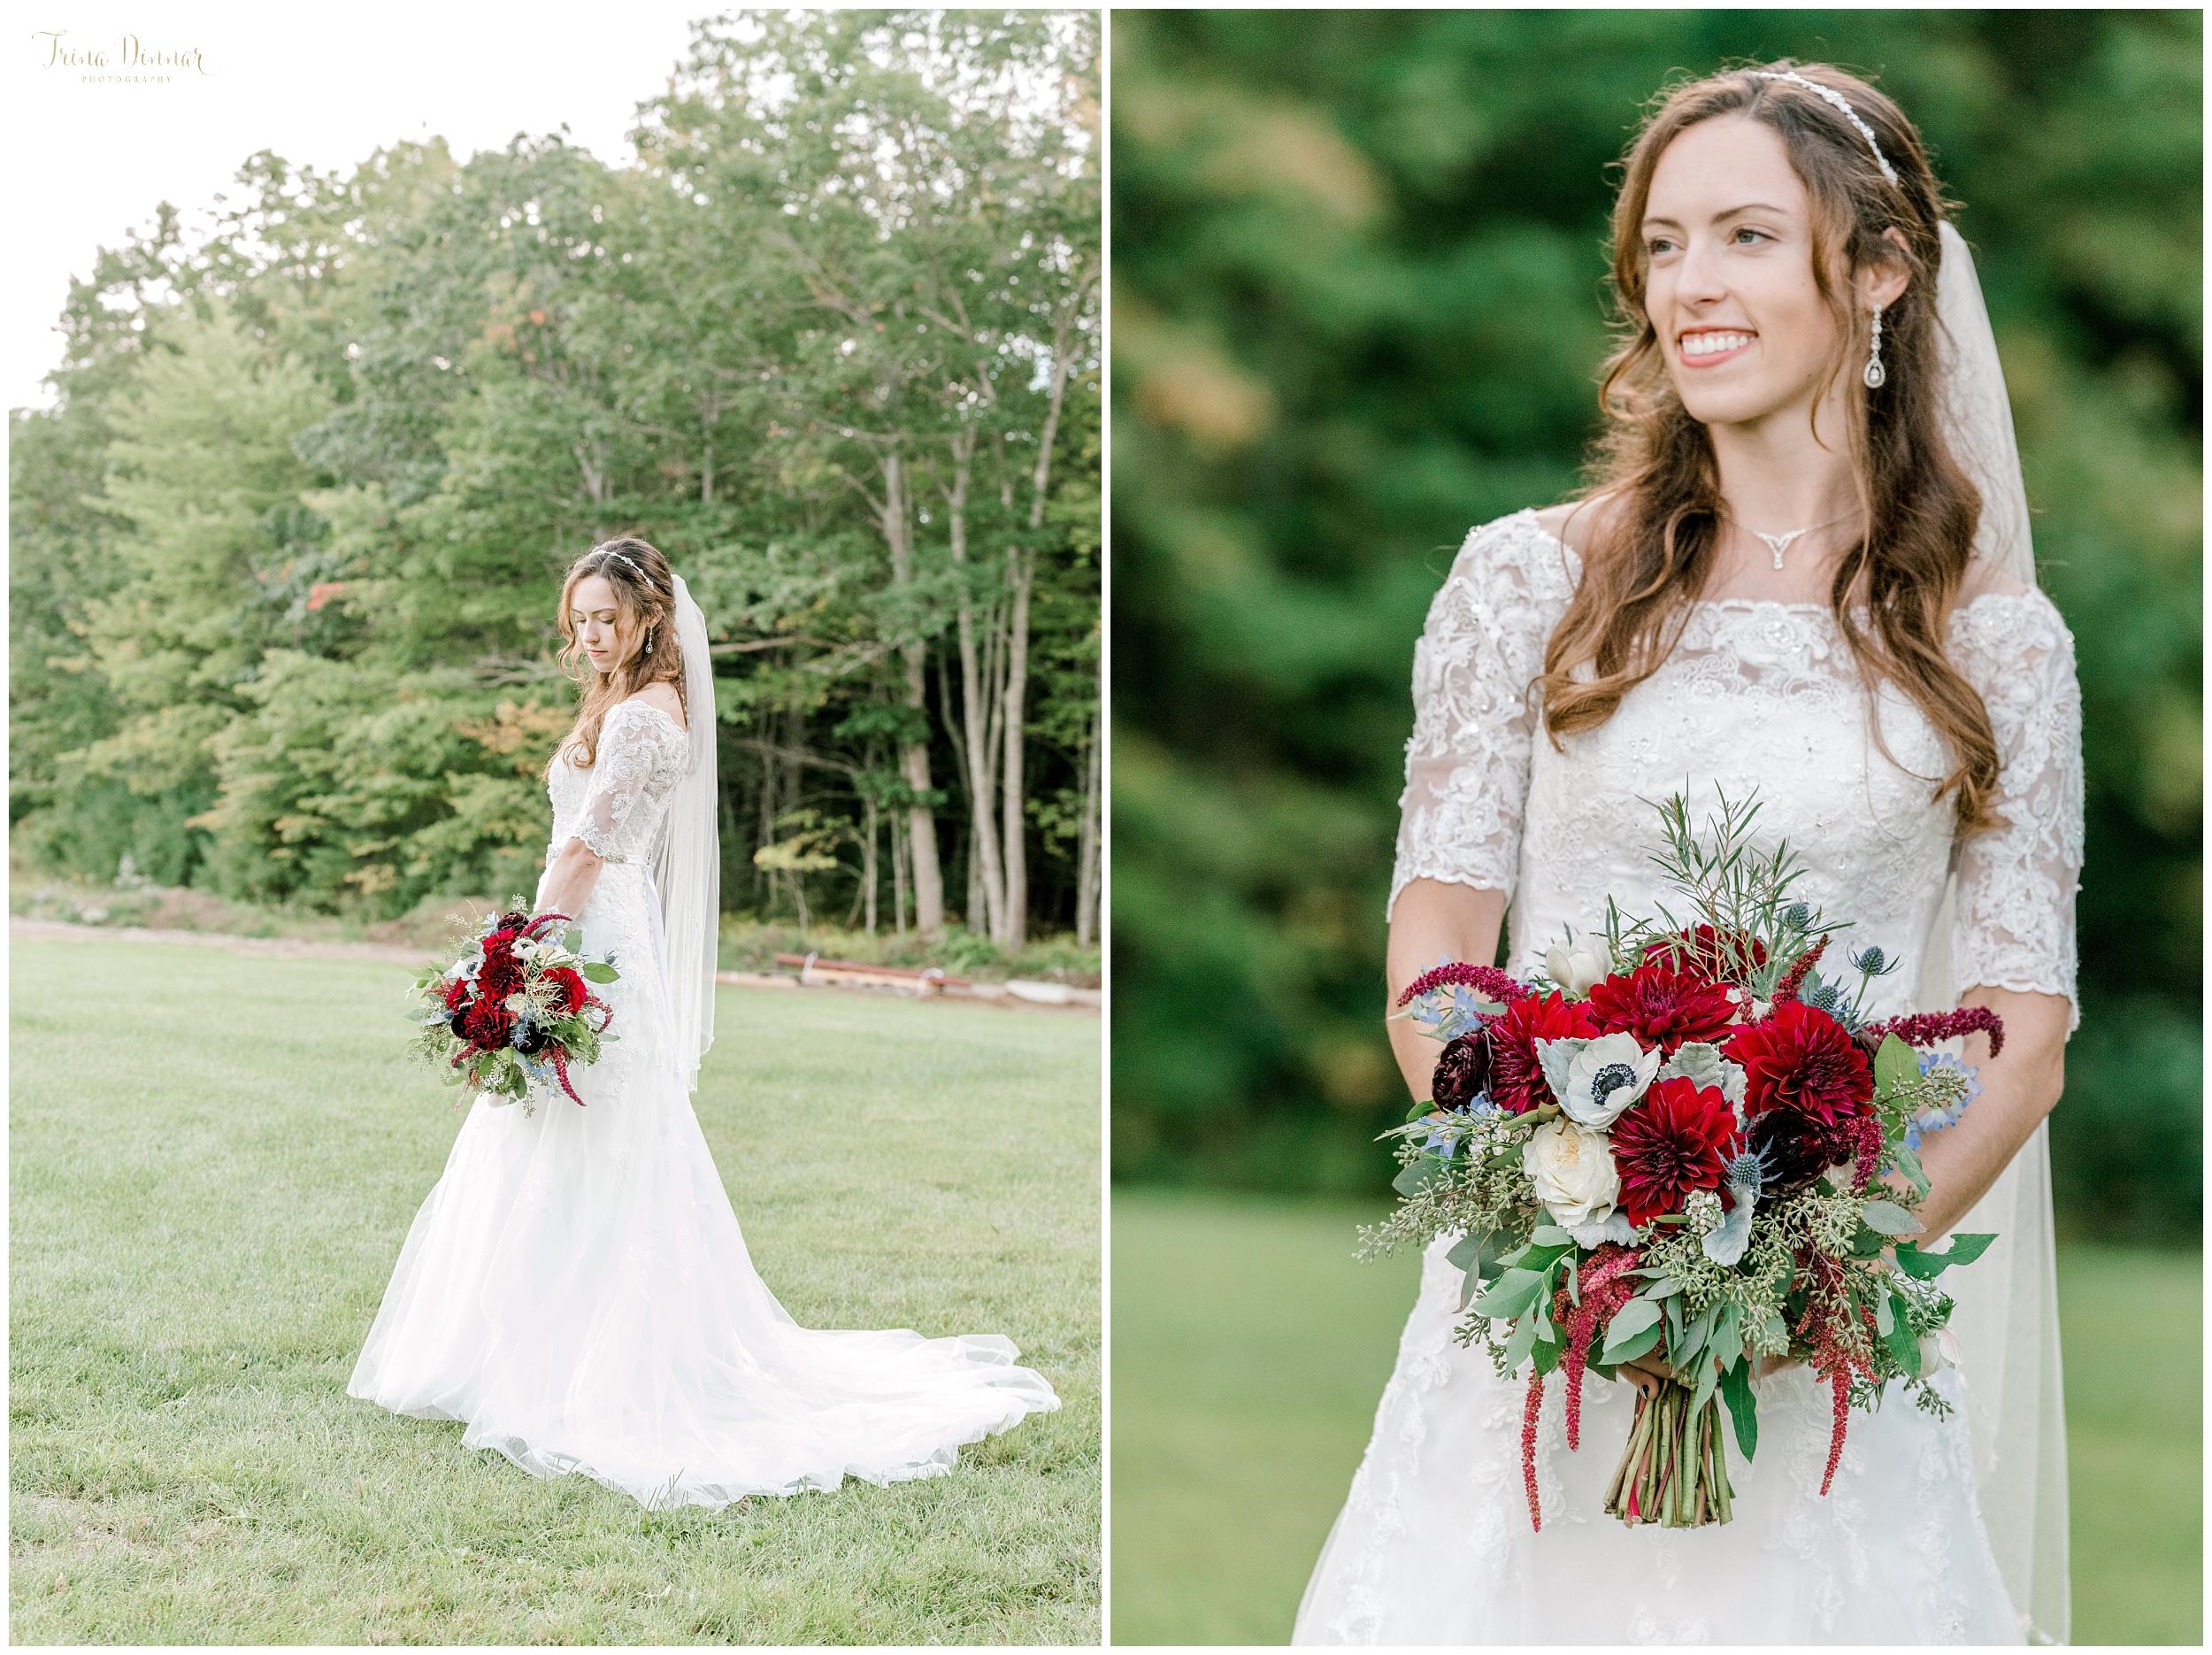 Jennifer's Southern Maine bridal wedding portrait photography